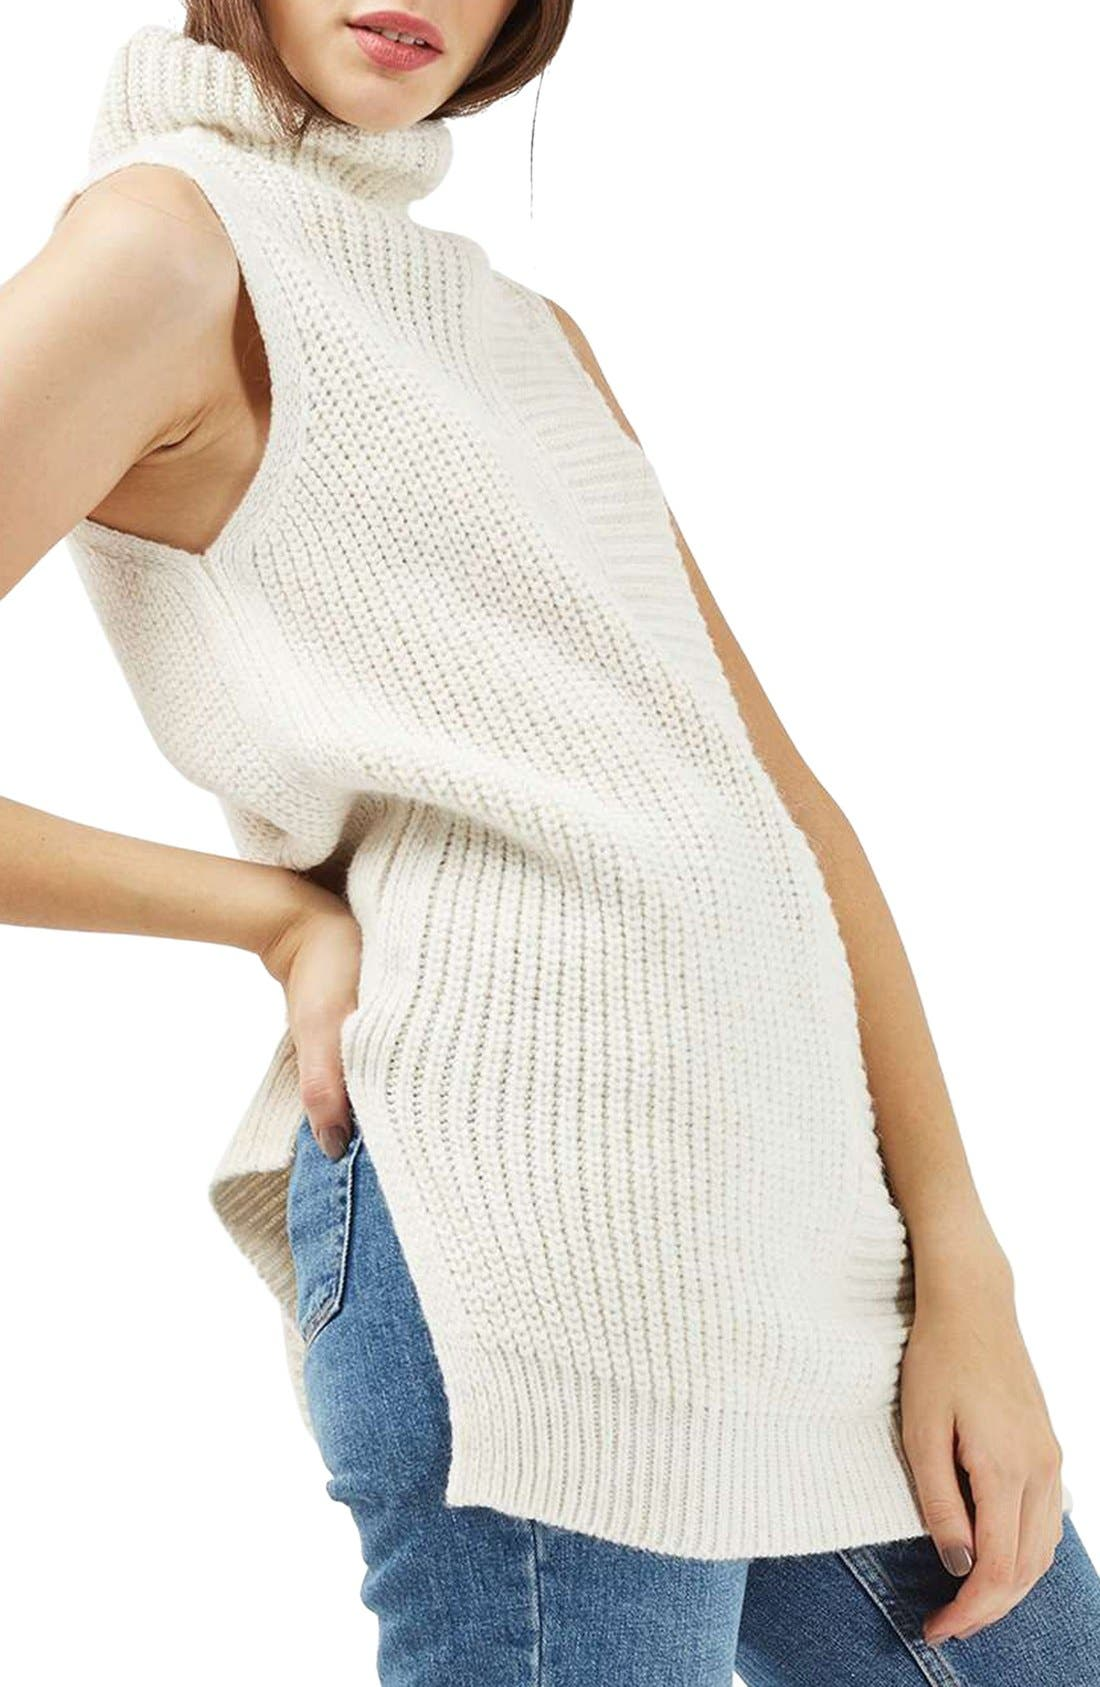 Alternate Image 1 Selected - Topshop Sleeveless Turtleneck Sweater